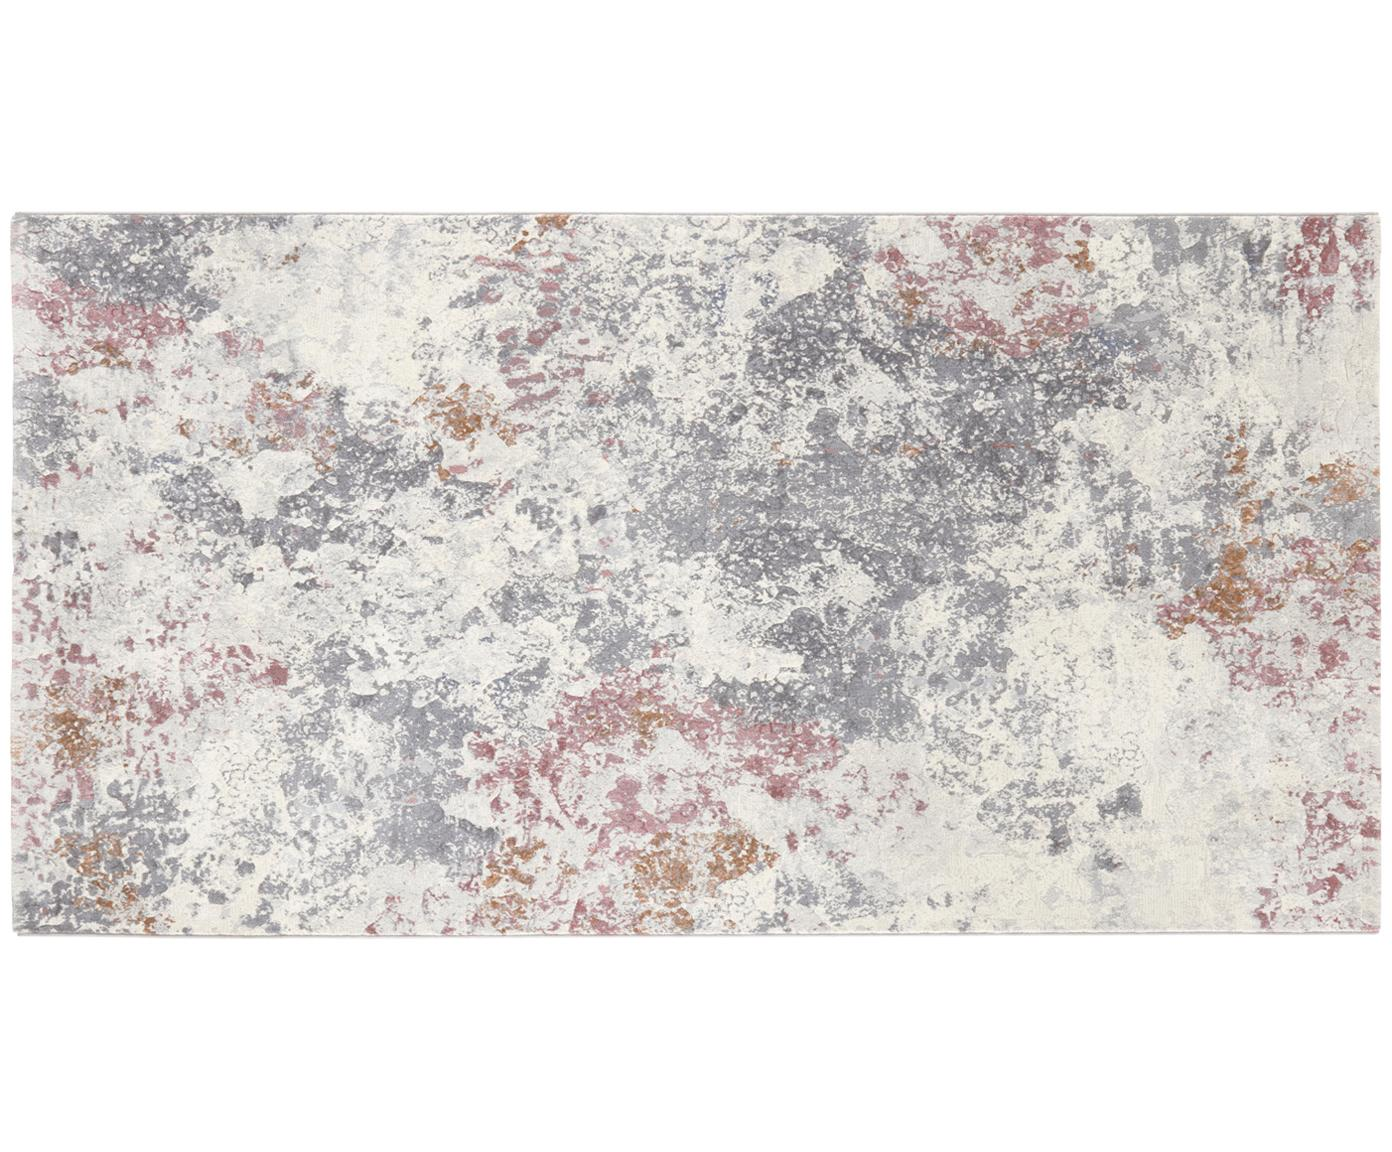 Designteppich Fontaine im Marmor-Look, Flor: 100% Polypropylen, Creme, Grau, Himbeerrot, B 80 x L 150 cm (Grösse XS)